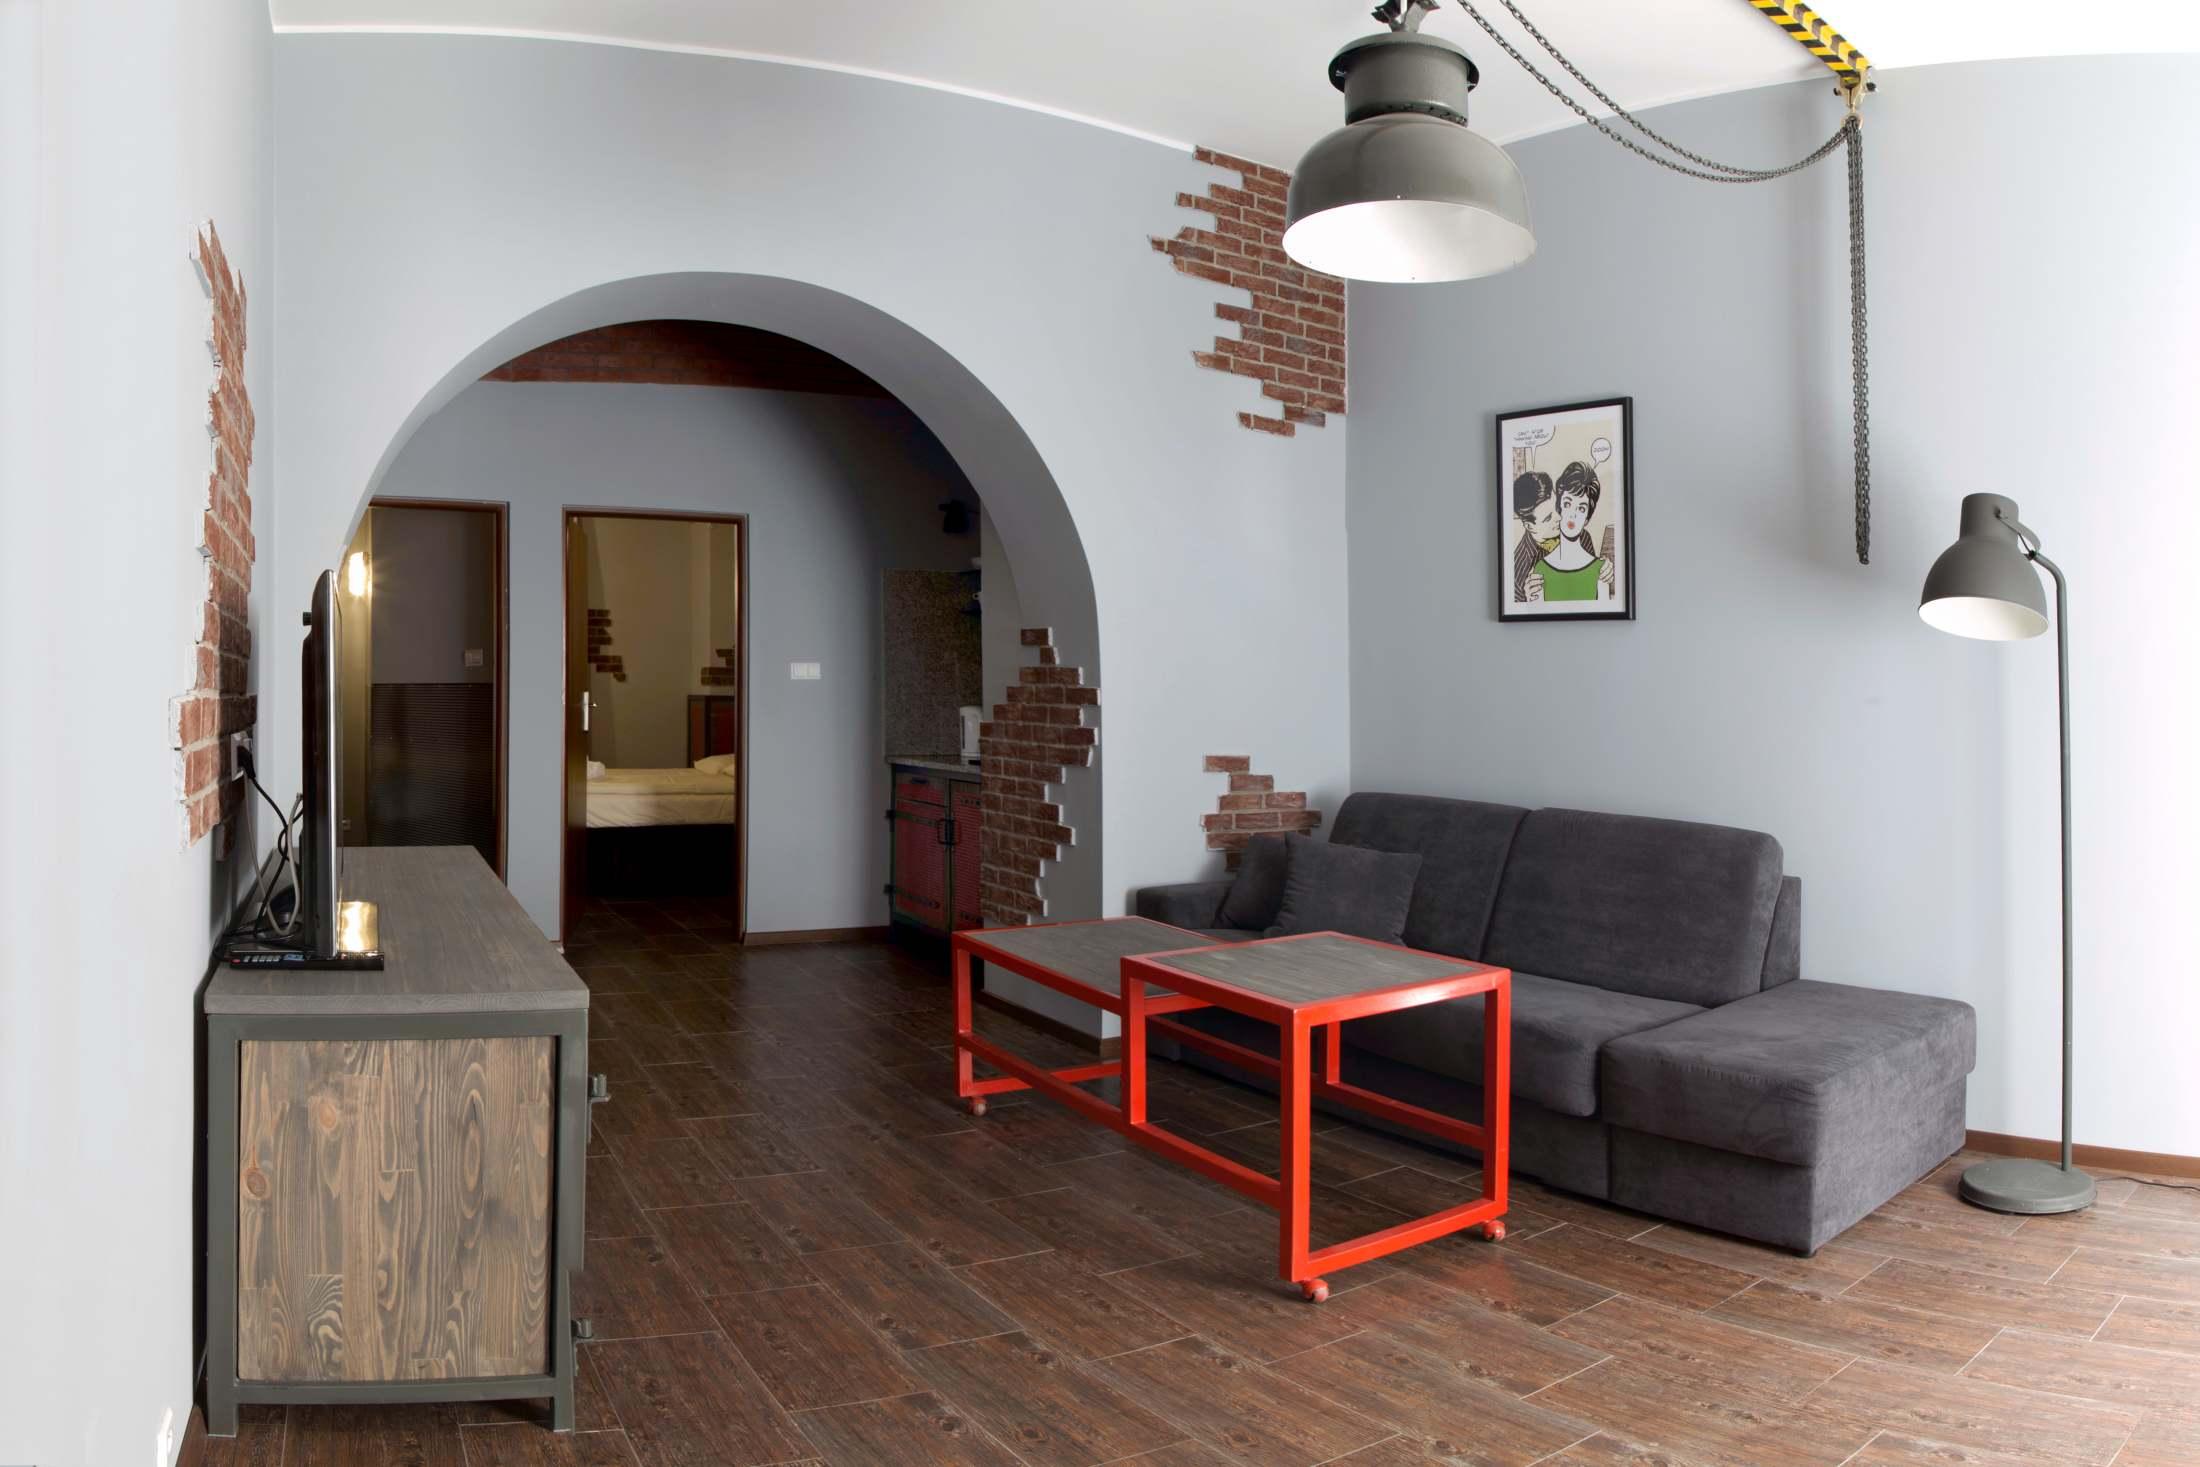 5 stars apartament centrum wrocławia